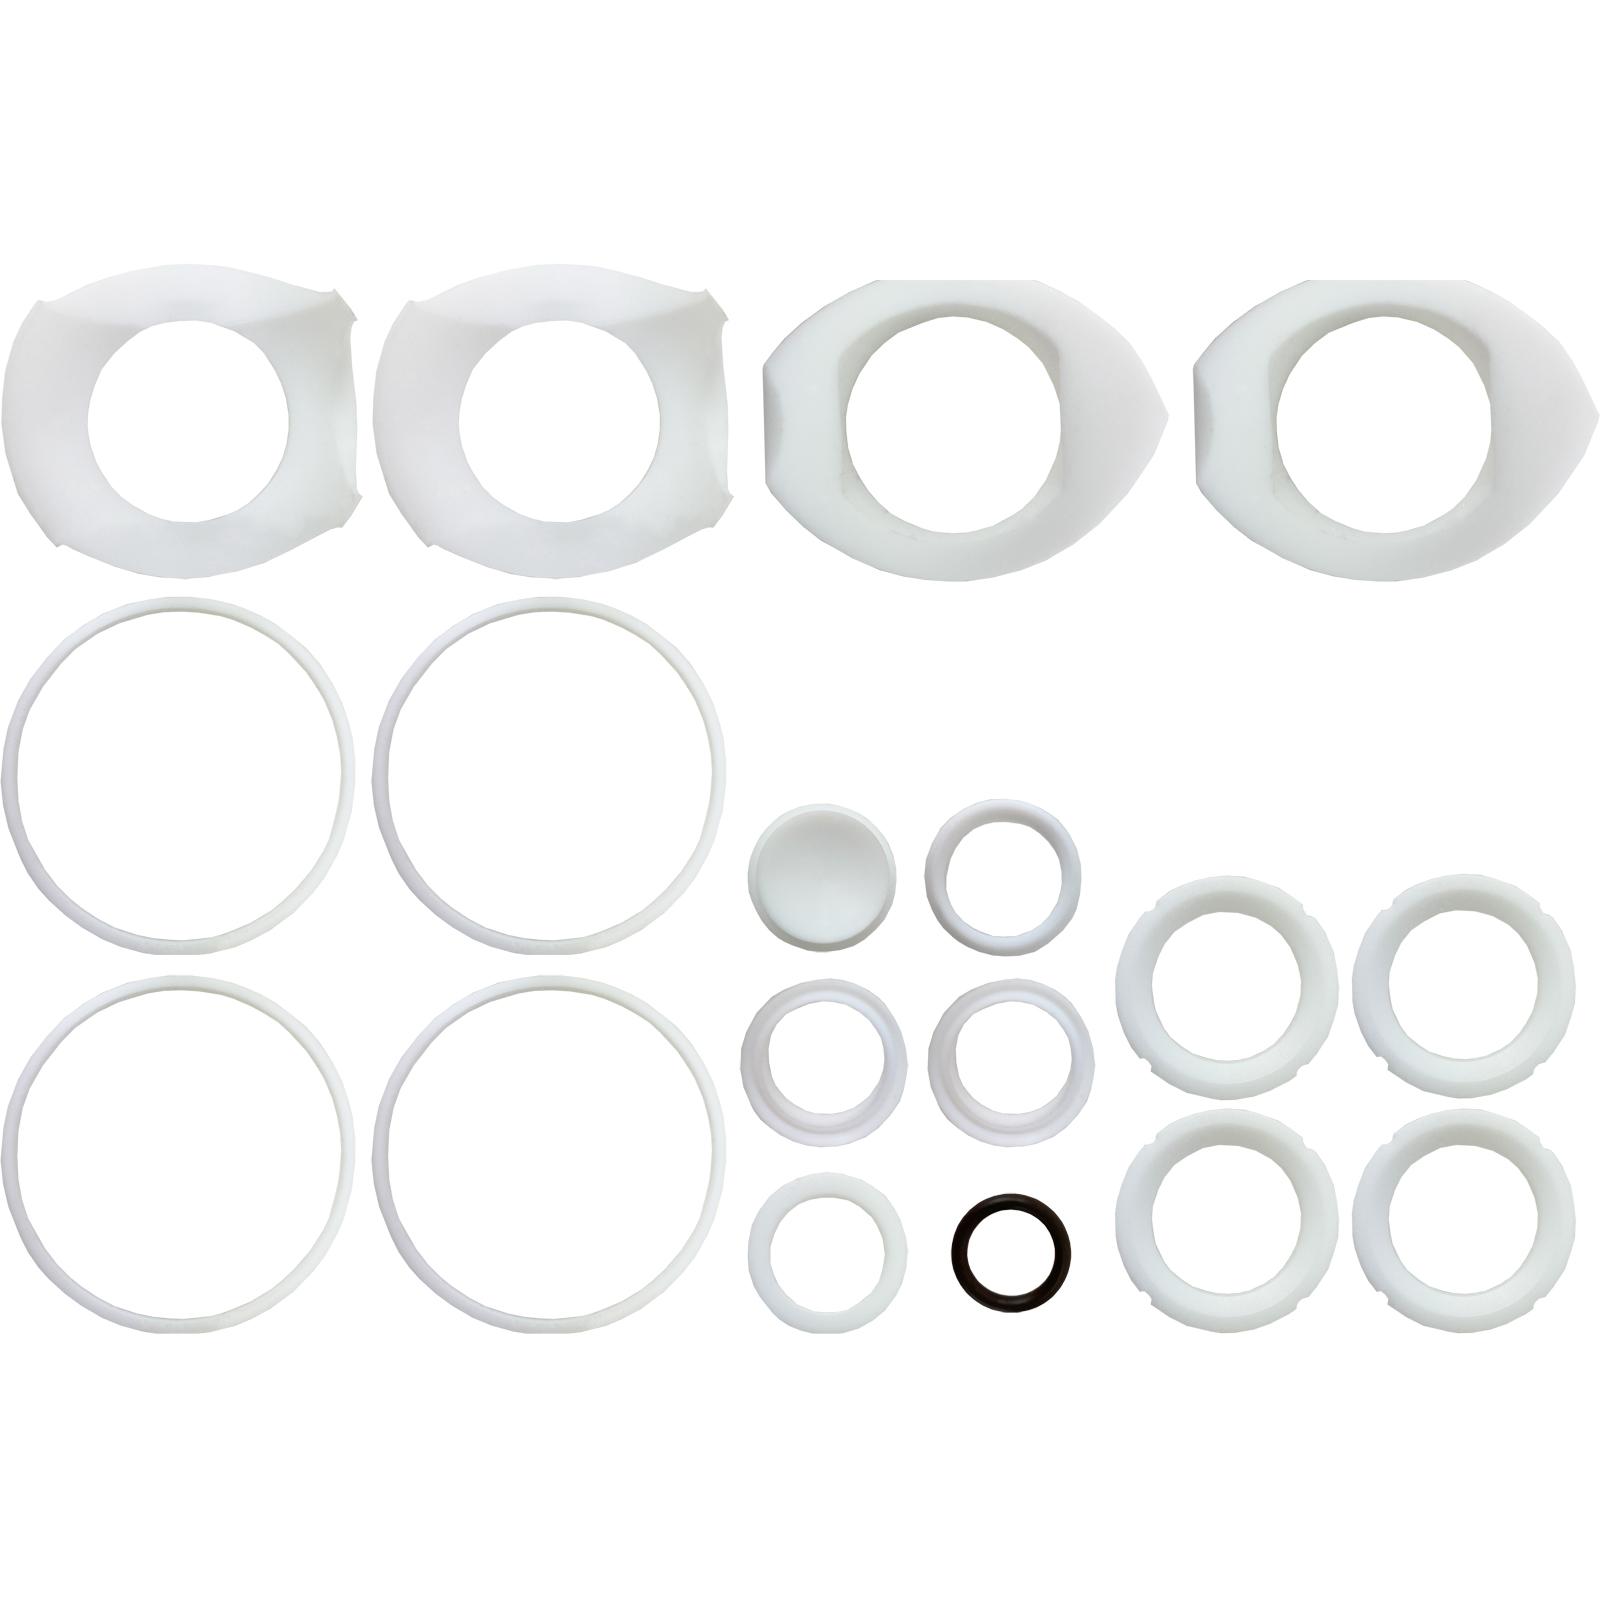 "3/4"" Sanitary Ball Valve Seal Kit, 3 Way L-Port, Cavity Filled"